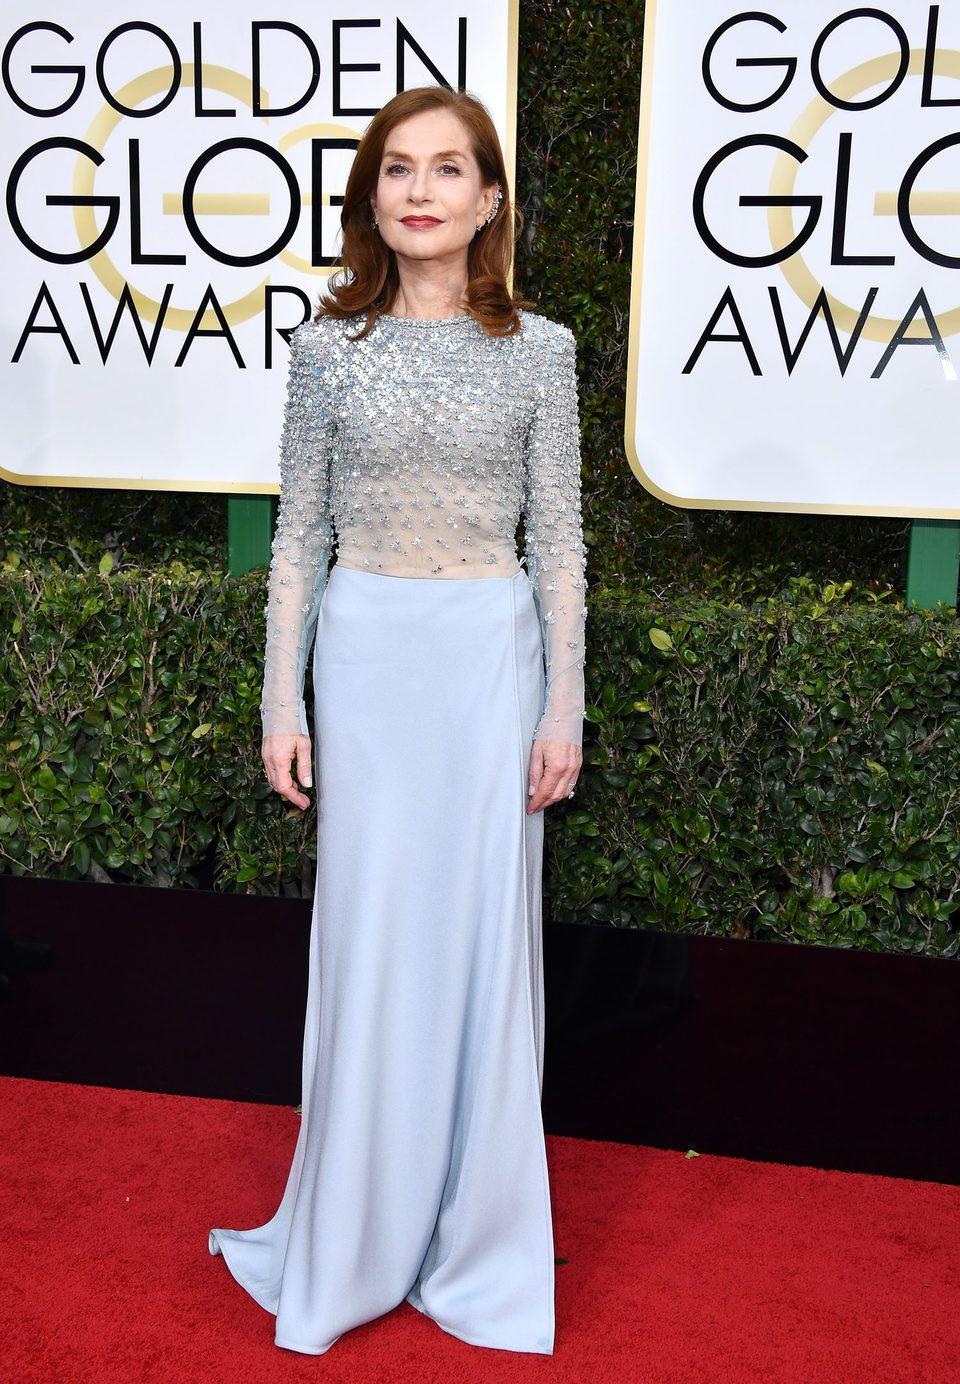 Isabelle Huppert at Golden Globes 2017 red carpet